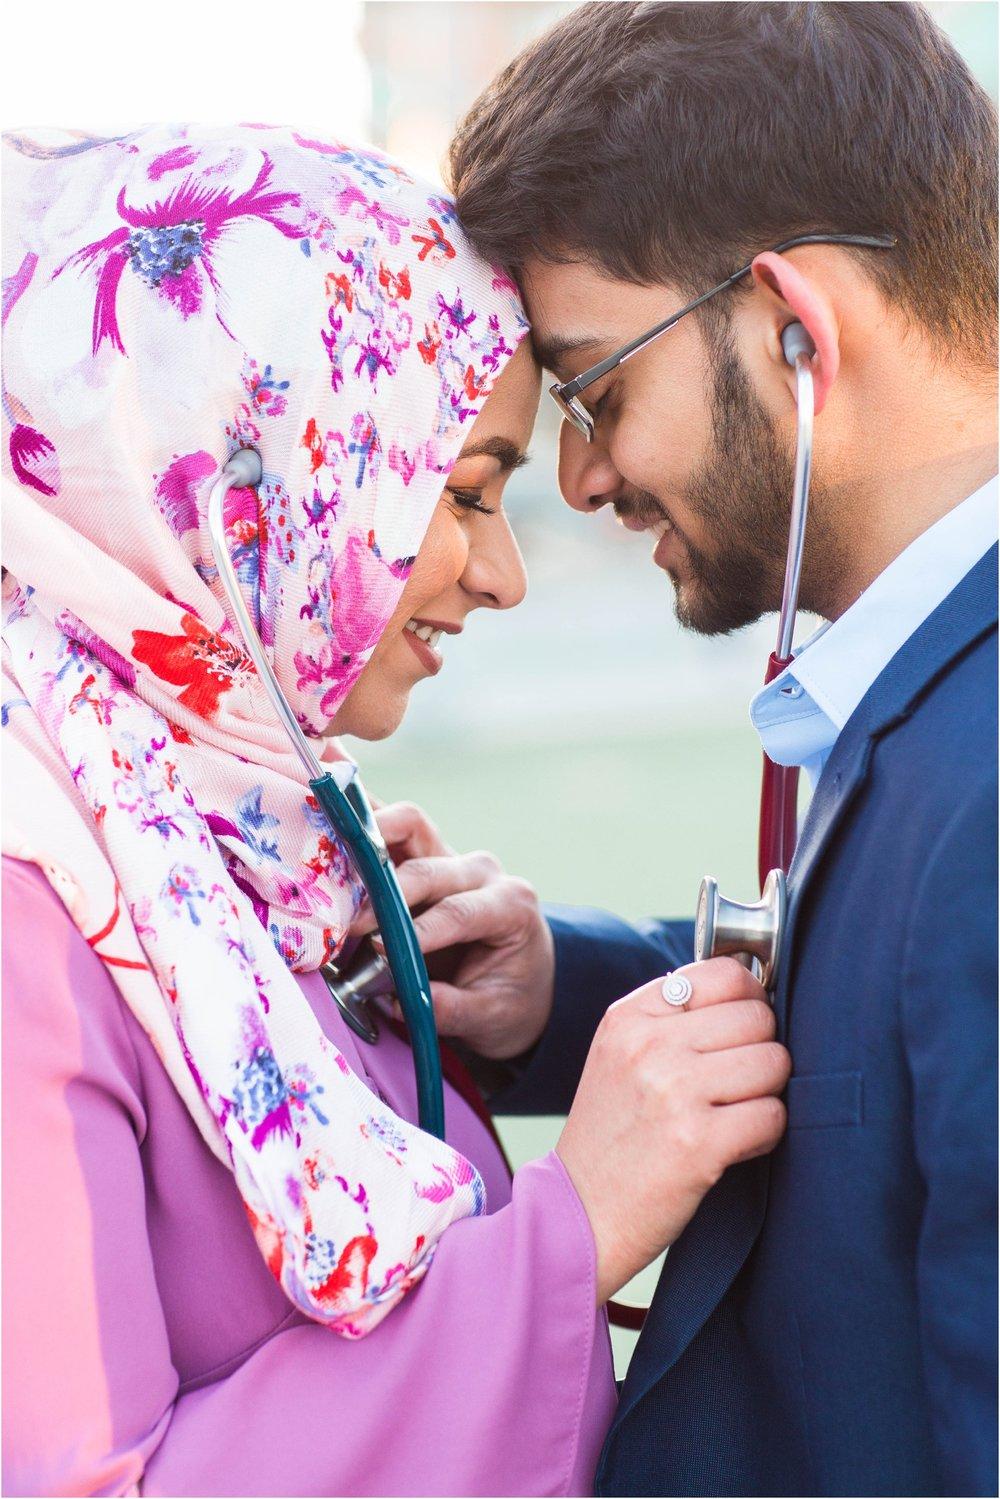 Shops-at-Don-Mills-Engagement-Session-Toronto-Mississauga-Brampton-Scarborough-GTA-Pakistani-Indian-Wedding-Engagement-Photographer-Photography_0030.jpg